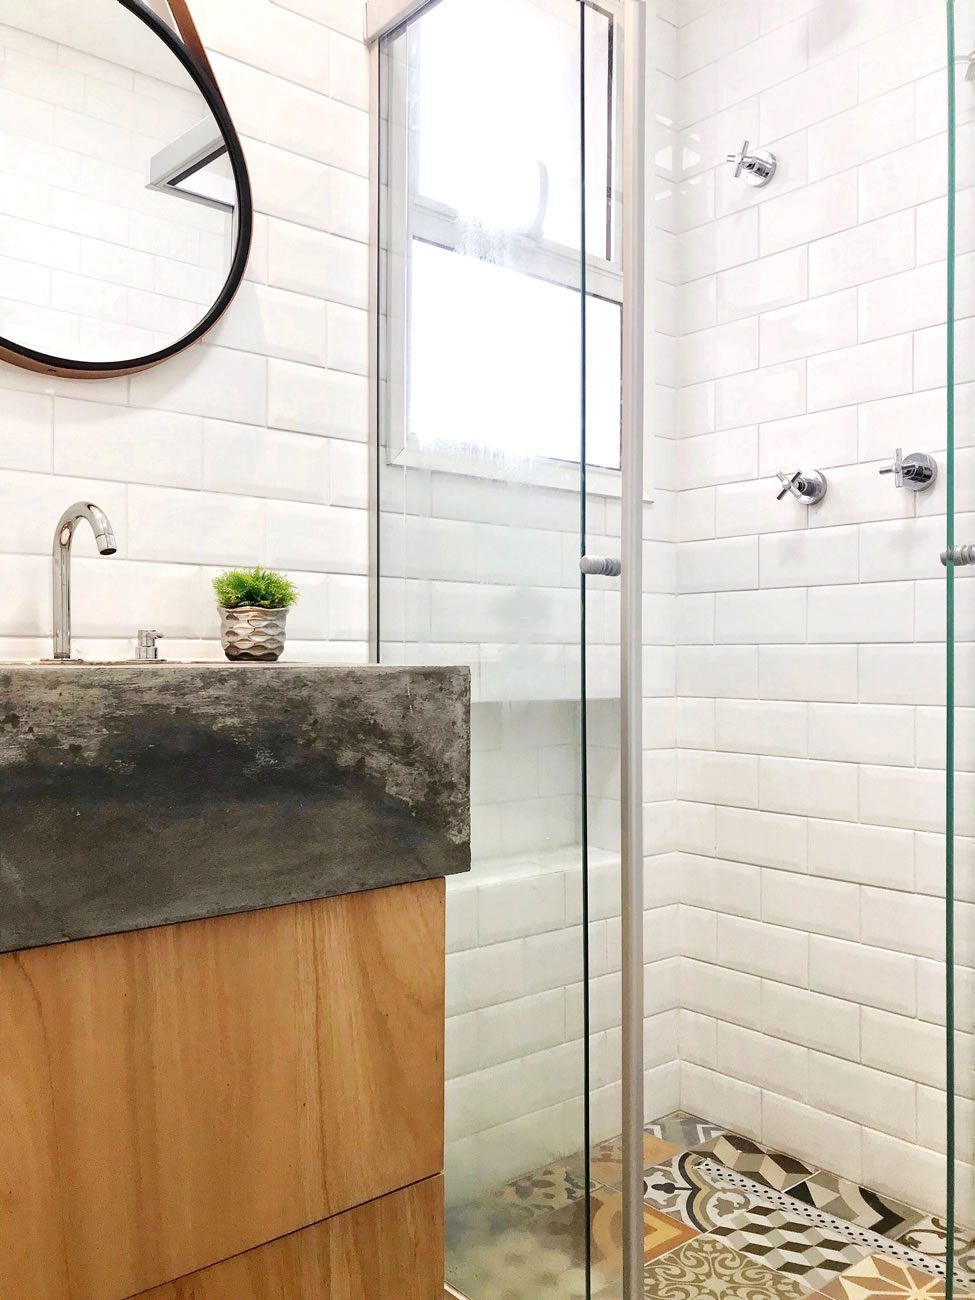 environment Eliane: laura-dall-anese-metro-white-10x20cm_essence-decor-ac-60x60cm-amb-01